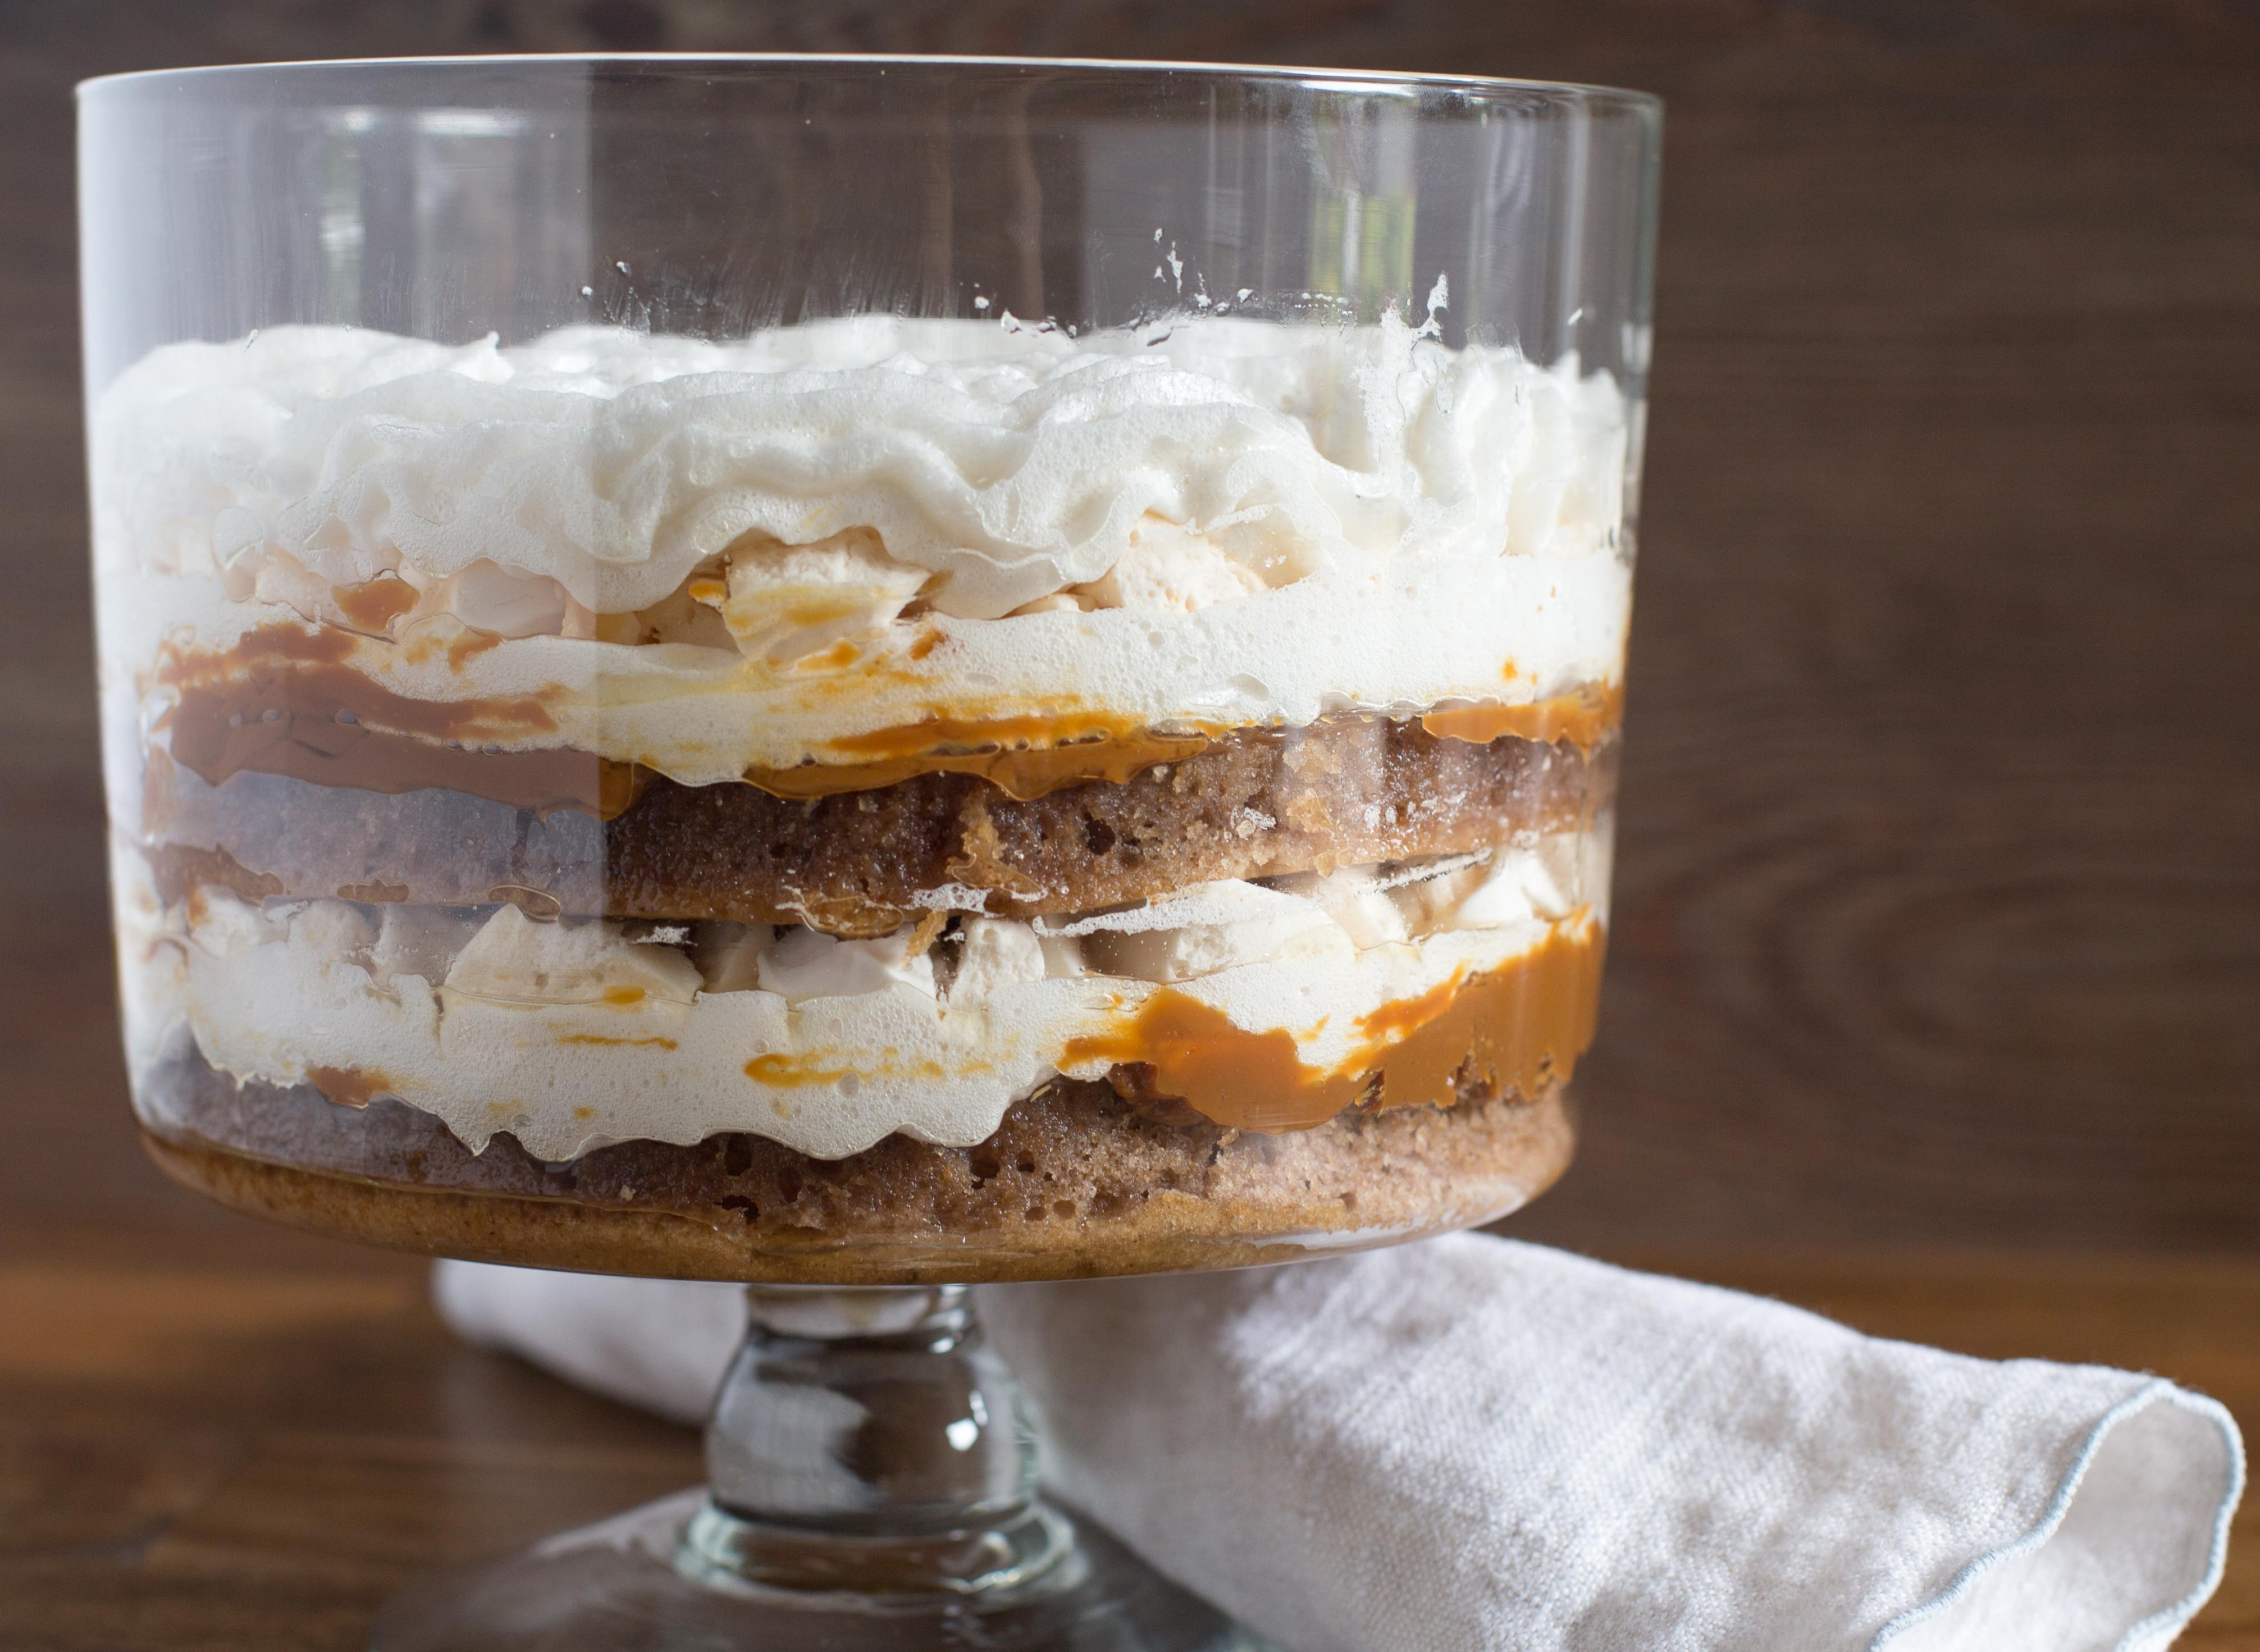 Walnut Dulce de Leche Meringue Cake